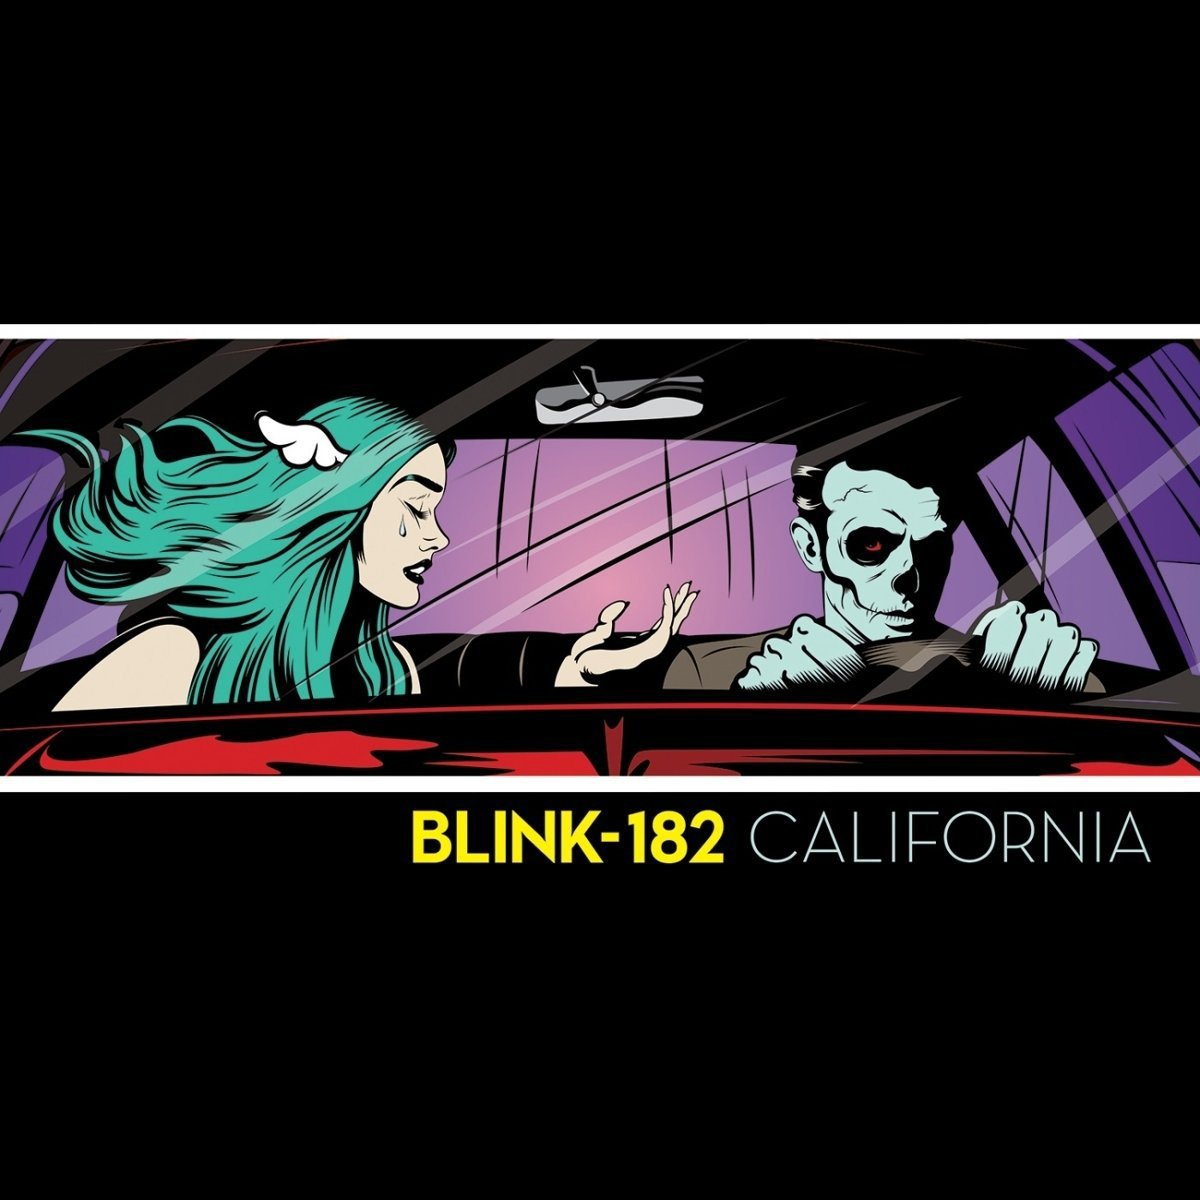 California (Colour Vinyl) [12 inch Analog]                                                                                                                                                                                                                                                    <span class=